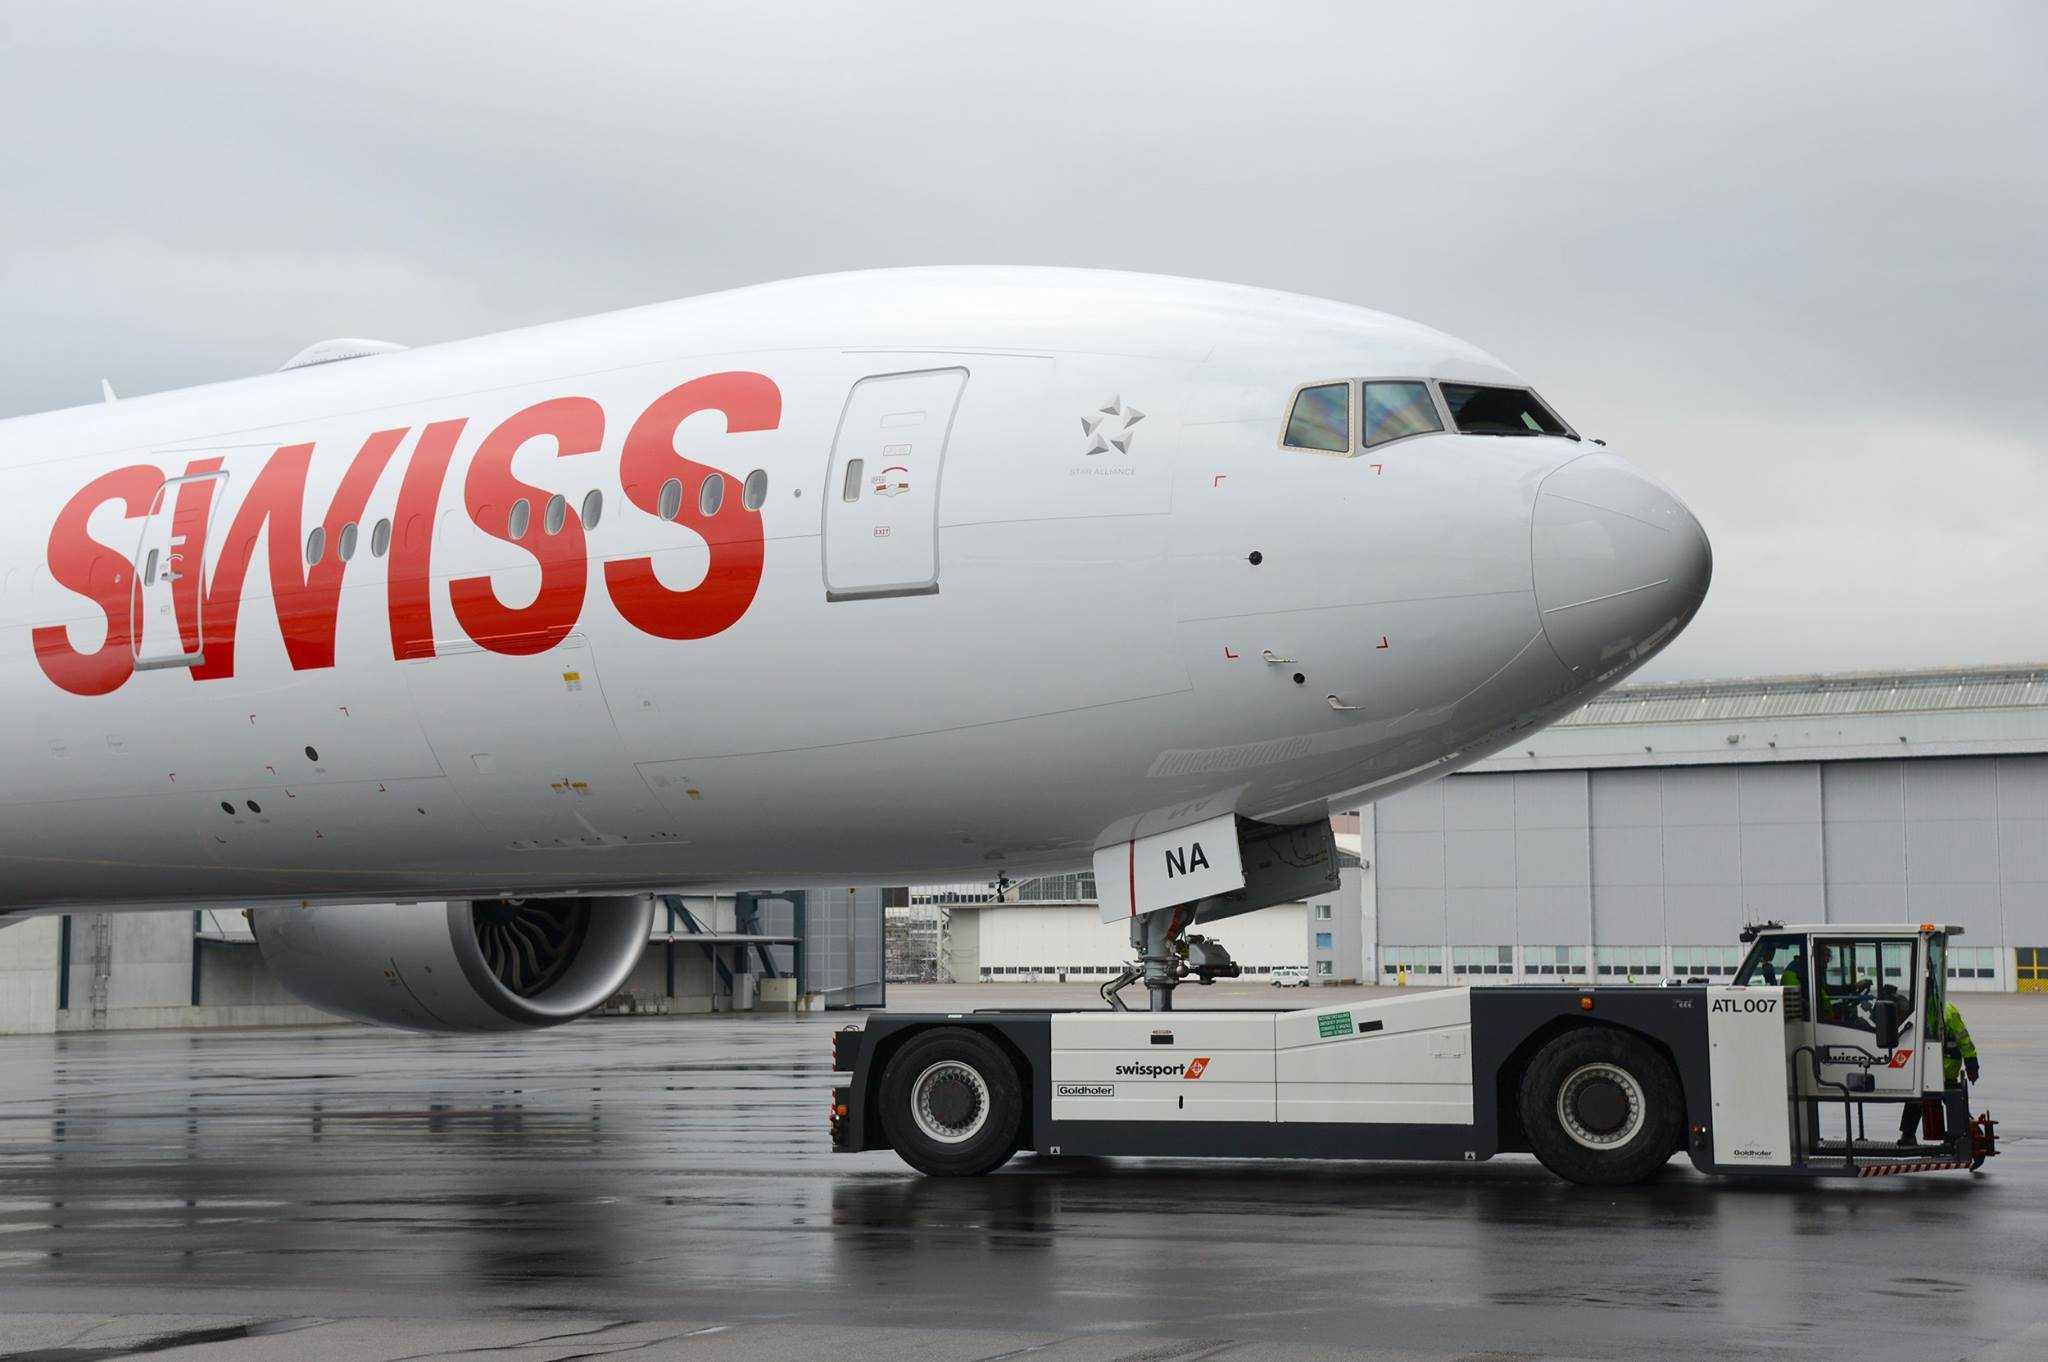 777 Swiss